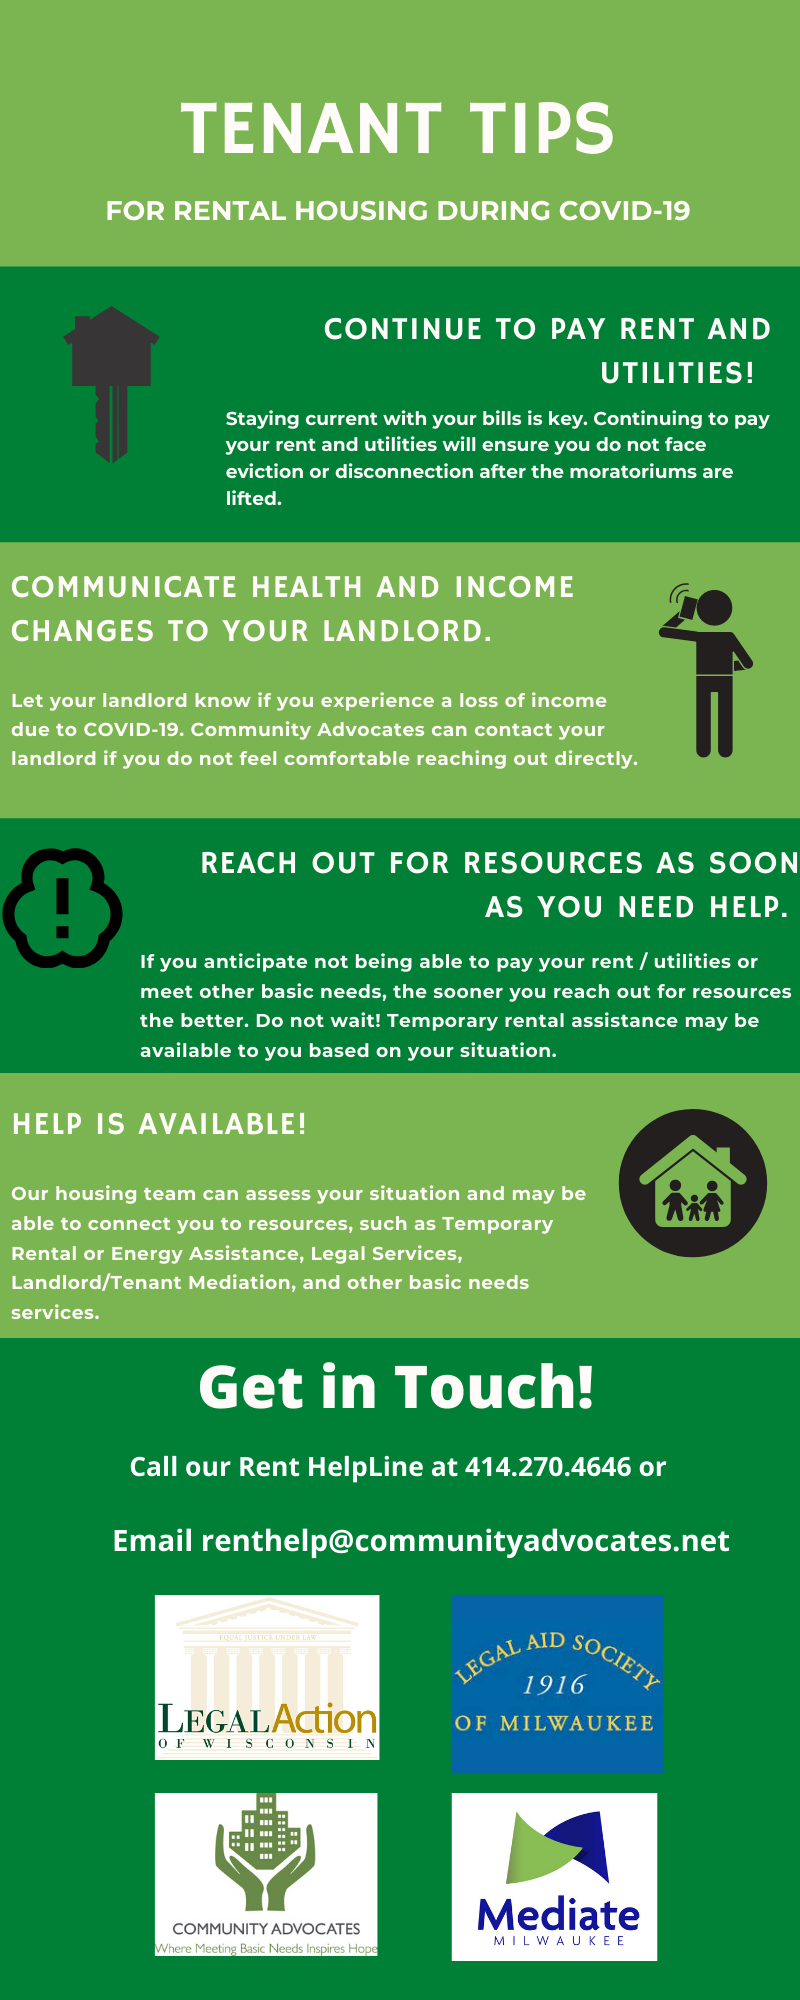 Rental Housing and the Coronavirus Public Health Emergency: What's Next?